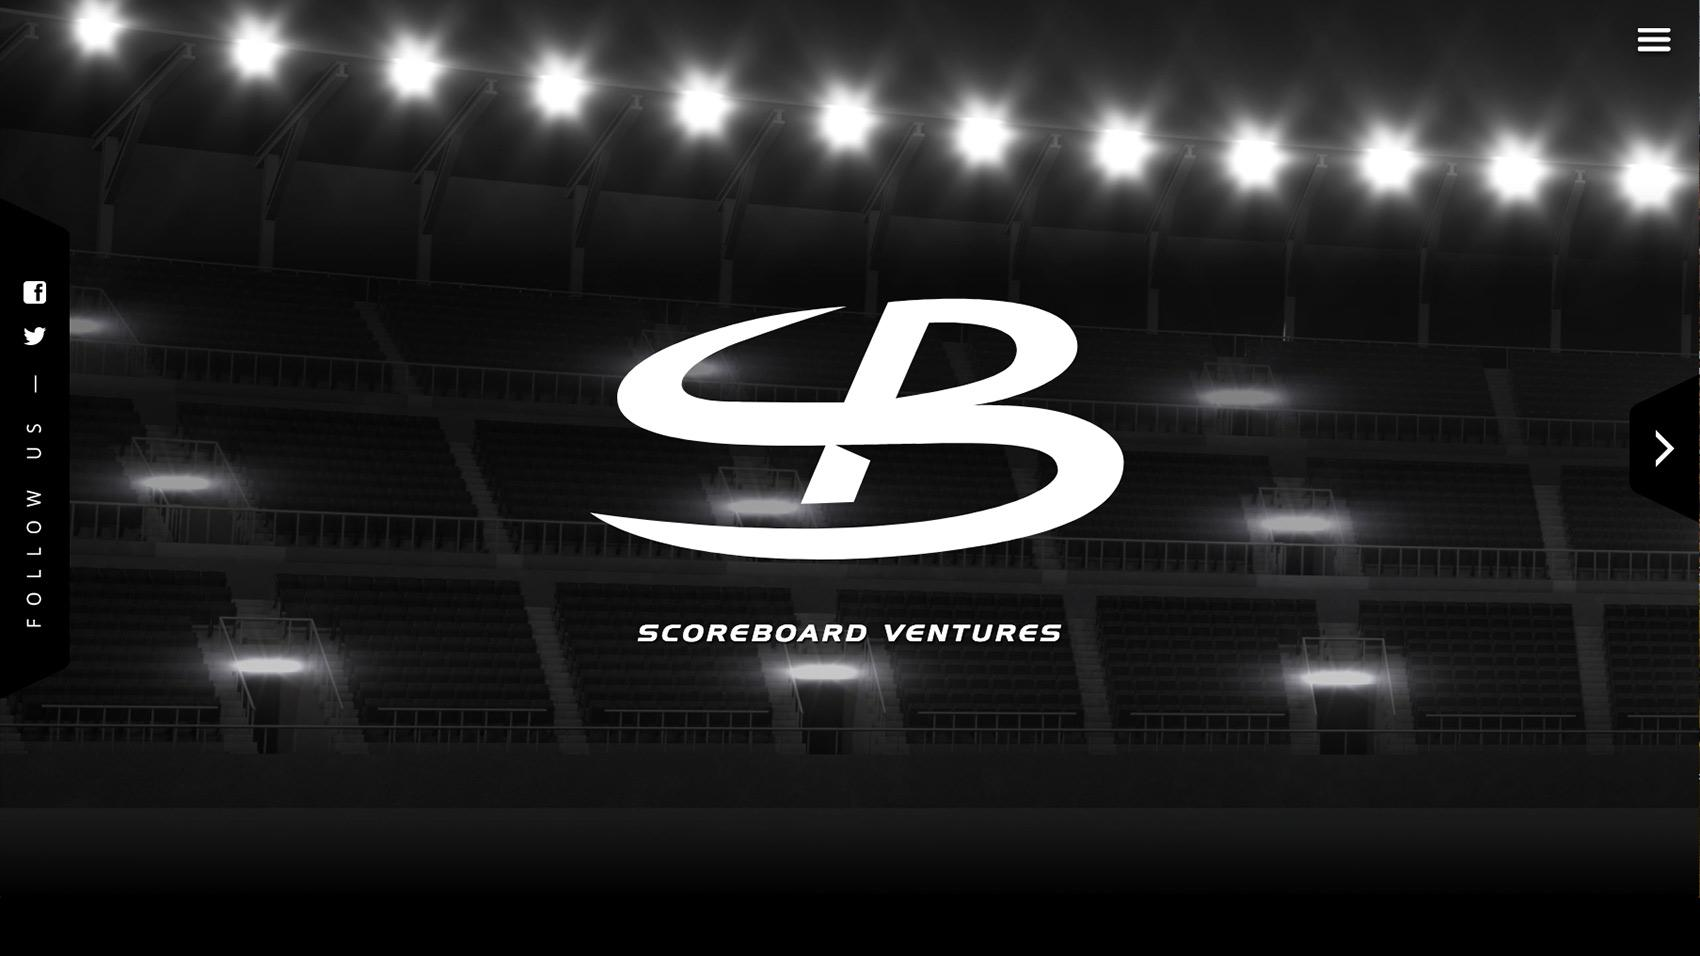 Scoreboard Ventures Demo Site